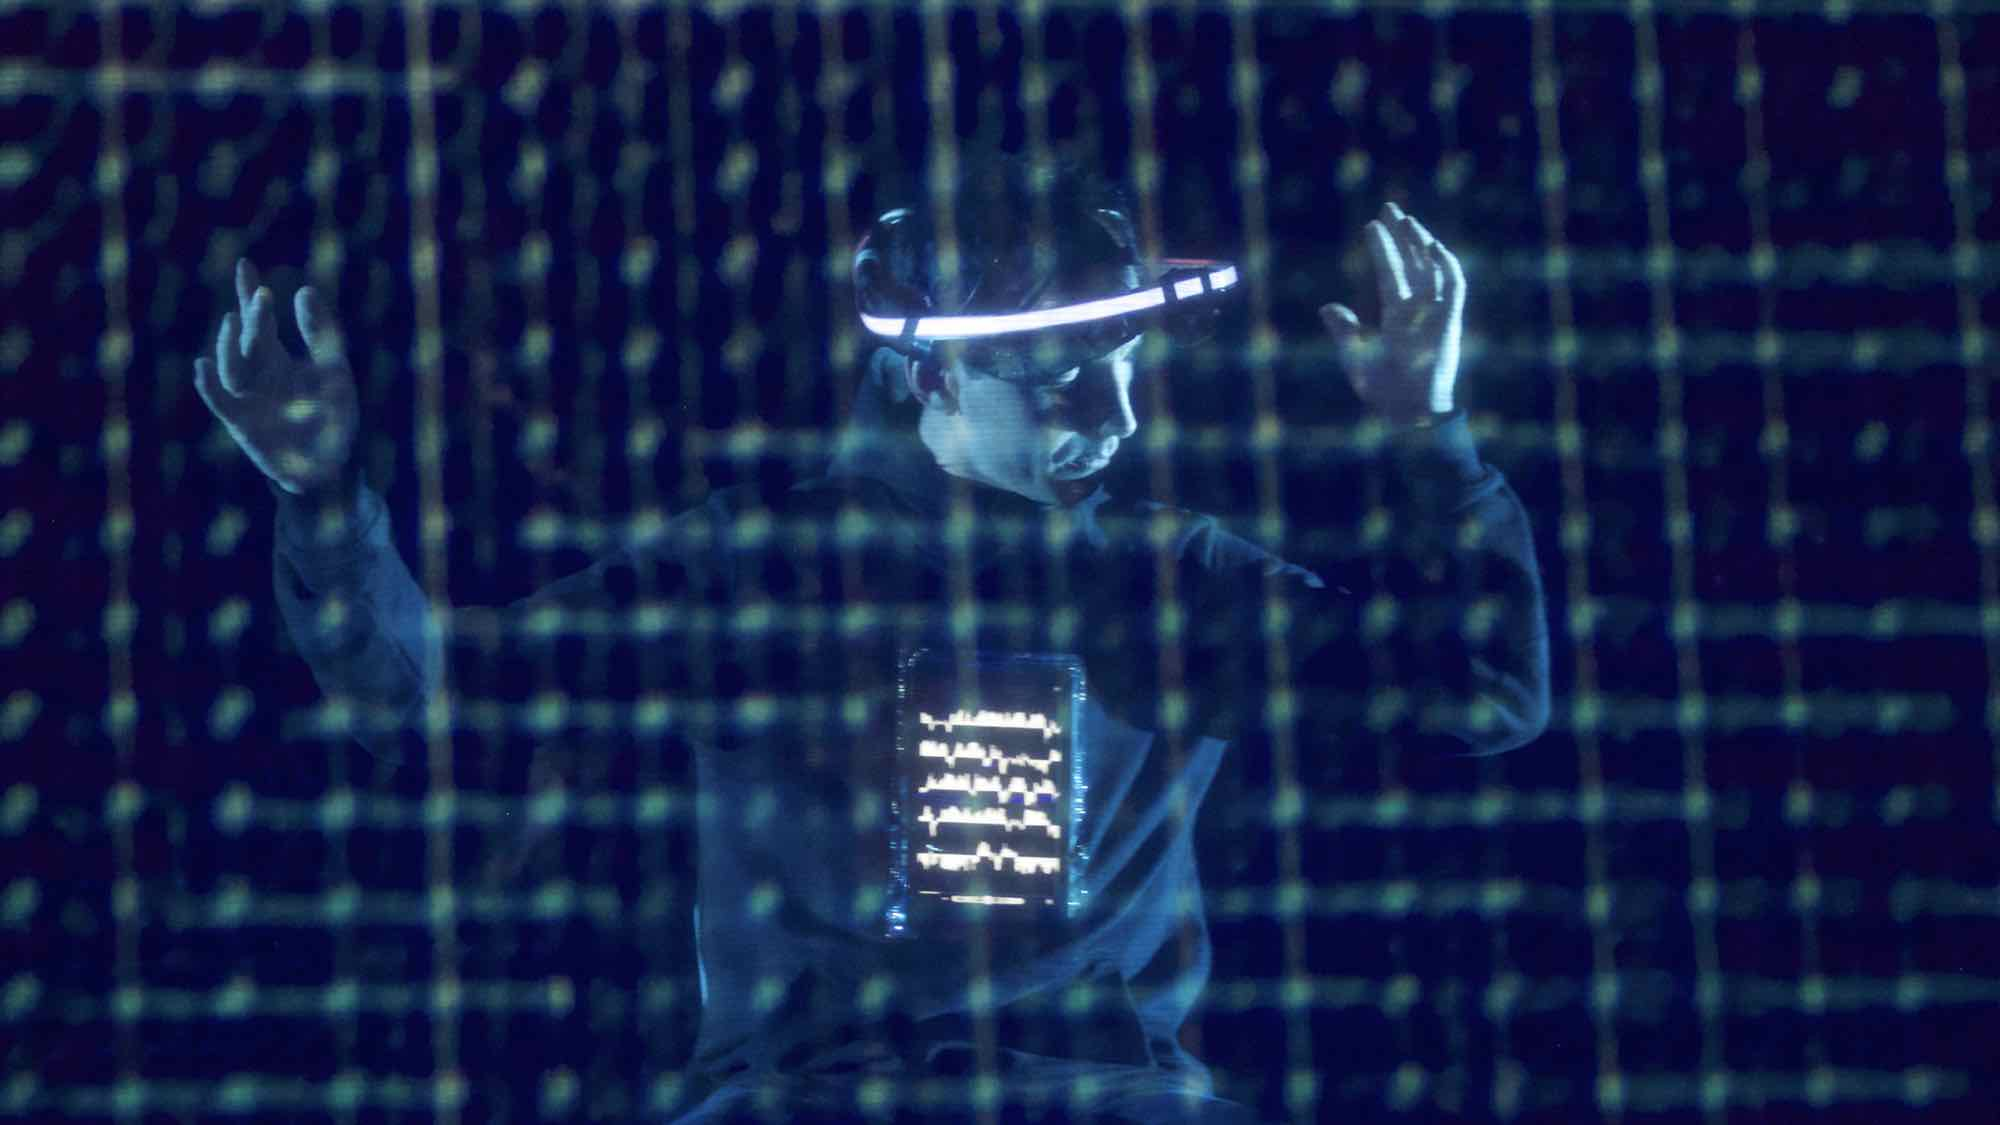 brainwave holograms